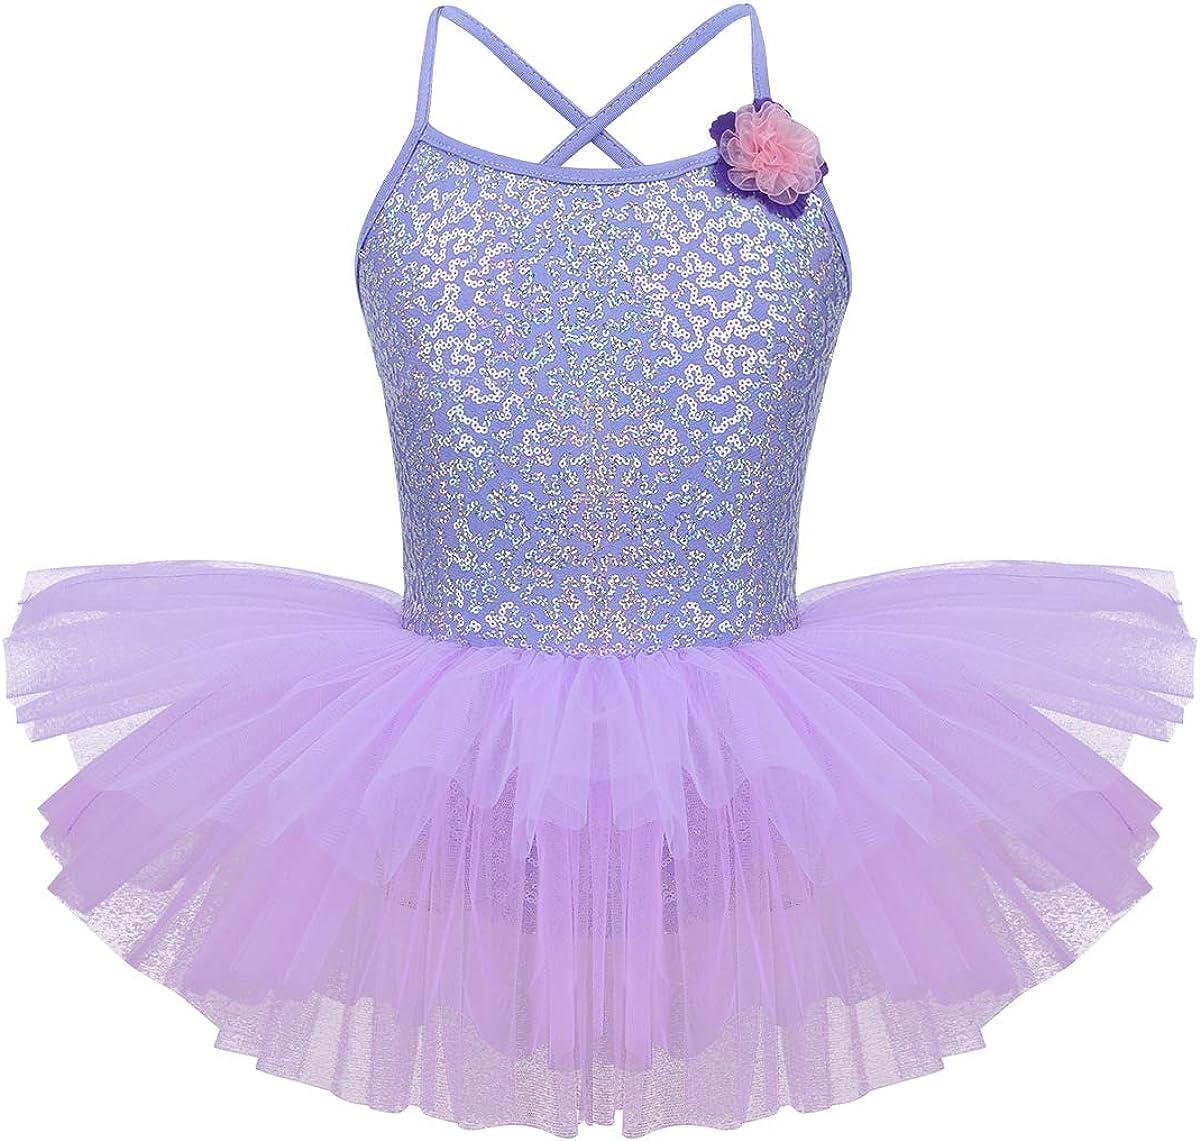 JEATHA Toddlers Little Girls Sequin Ballerina Fairy Dance Tutu Dress Leotard Team Basic Gymnastic Costume